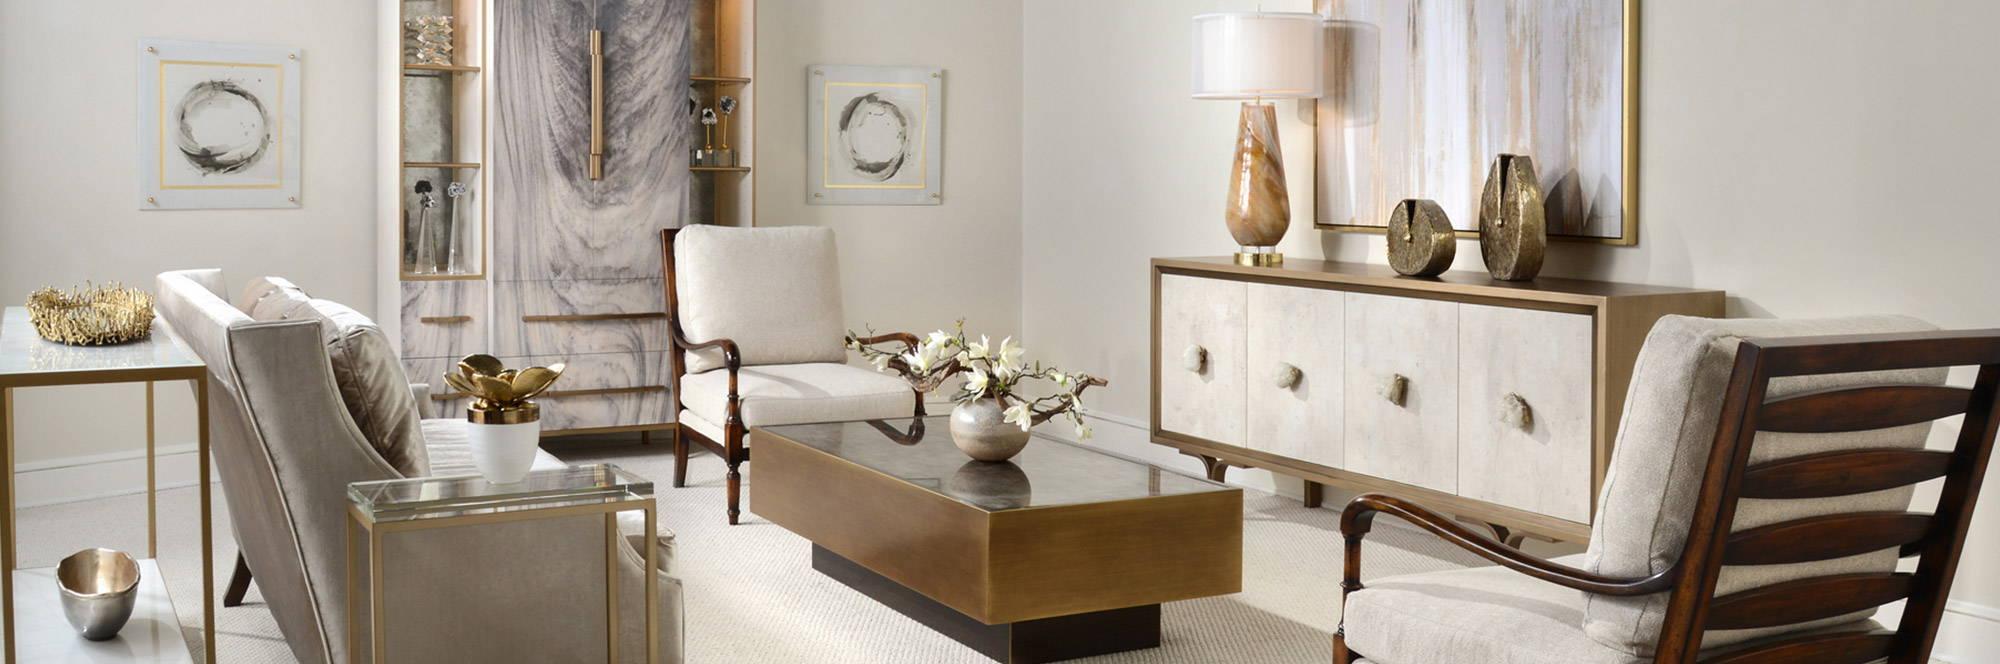 John-Richard Furniture, Wall Art & Home Accessories - Lounge Scheme - LuxDeco.com